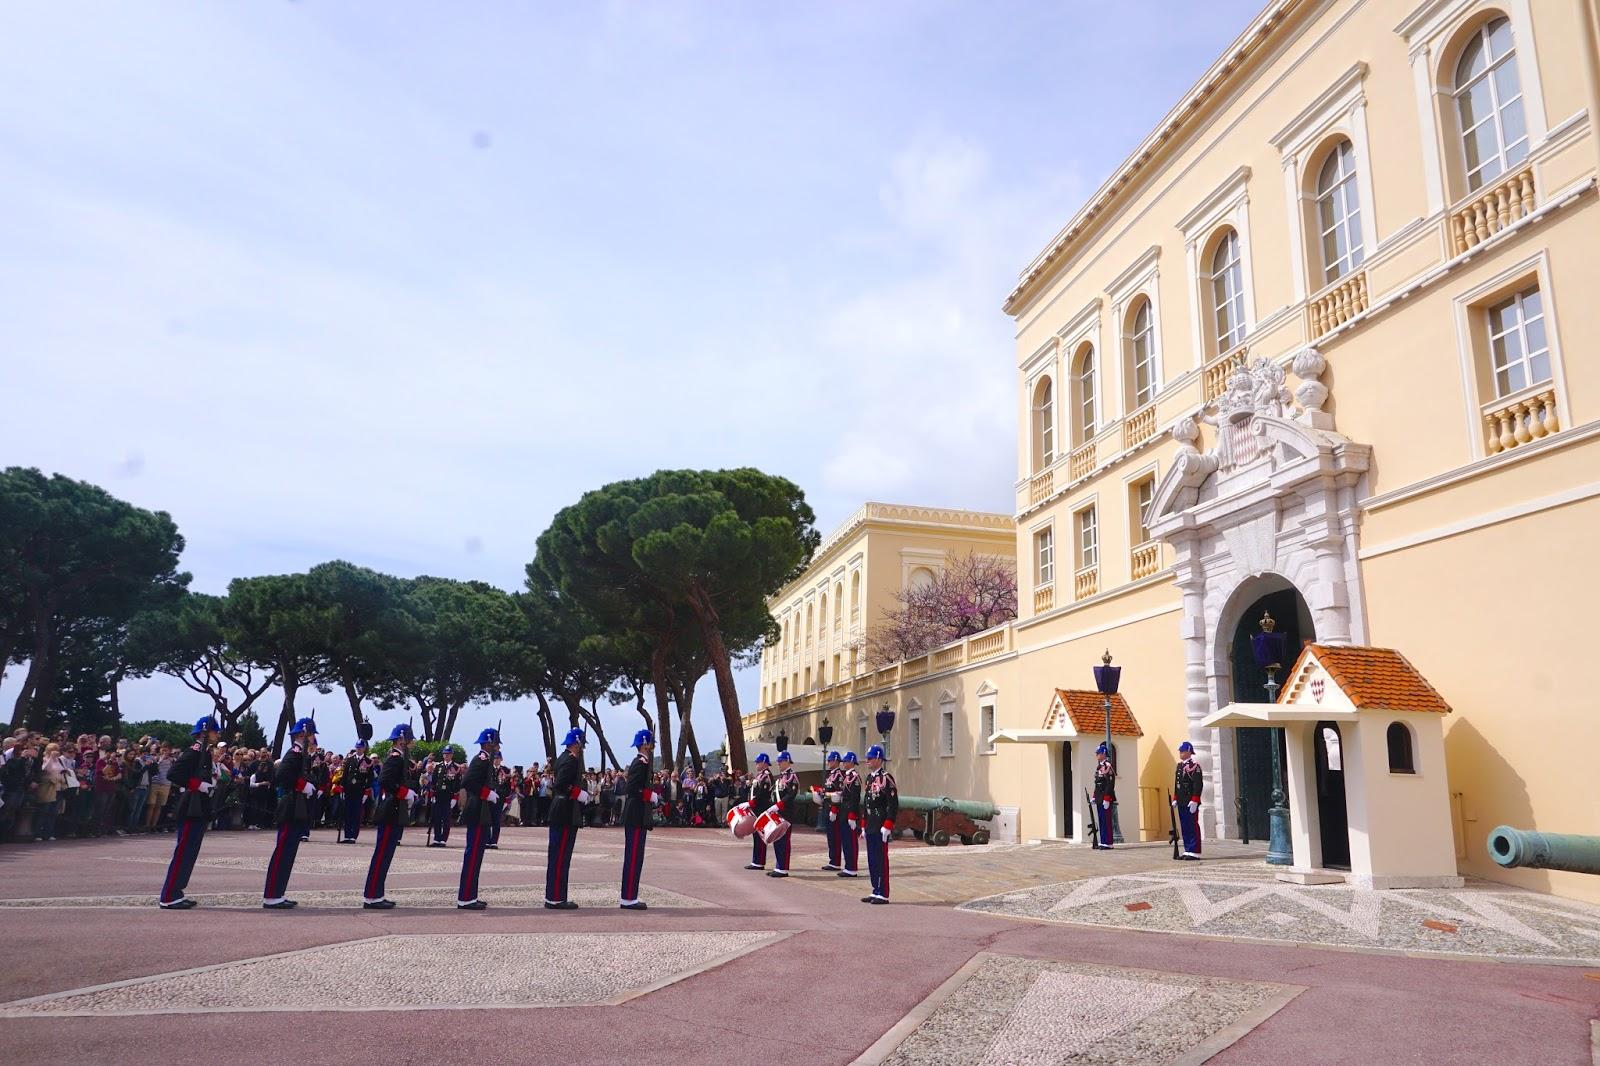 Monaco Prince's Palace of Monaco